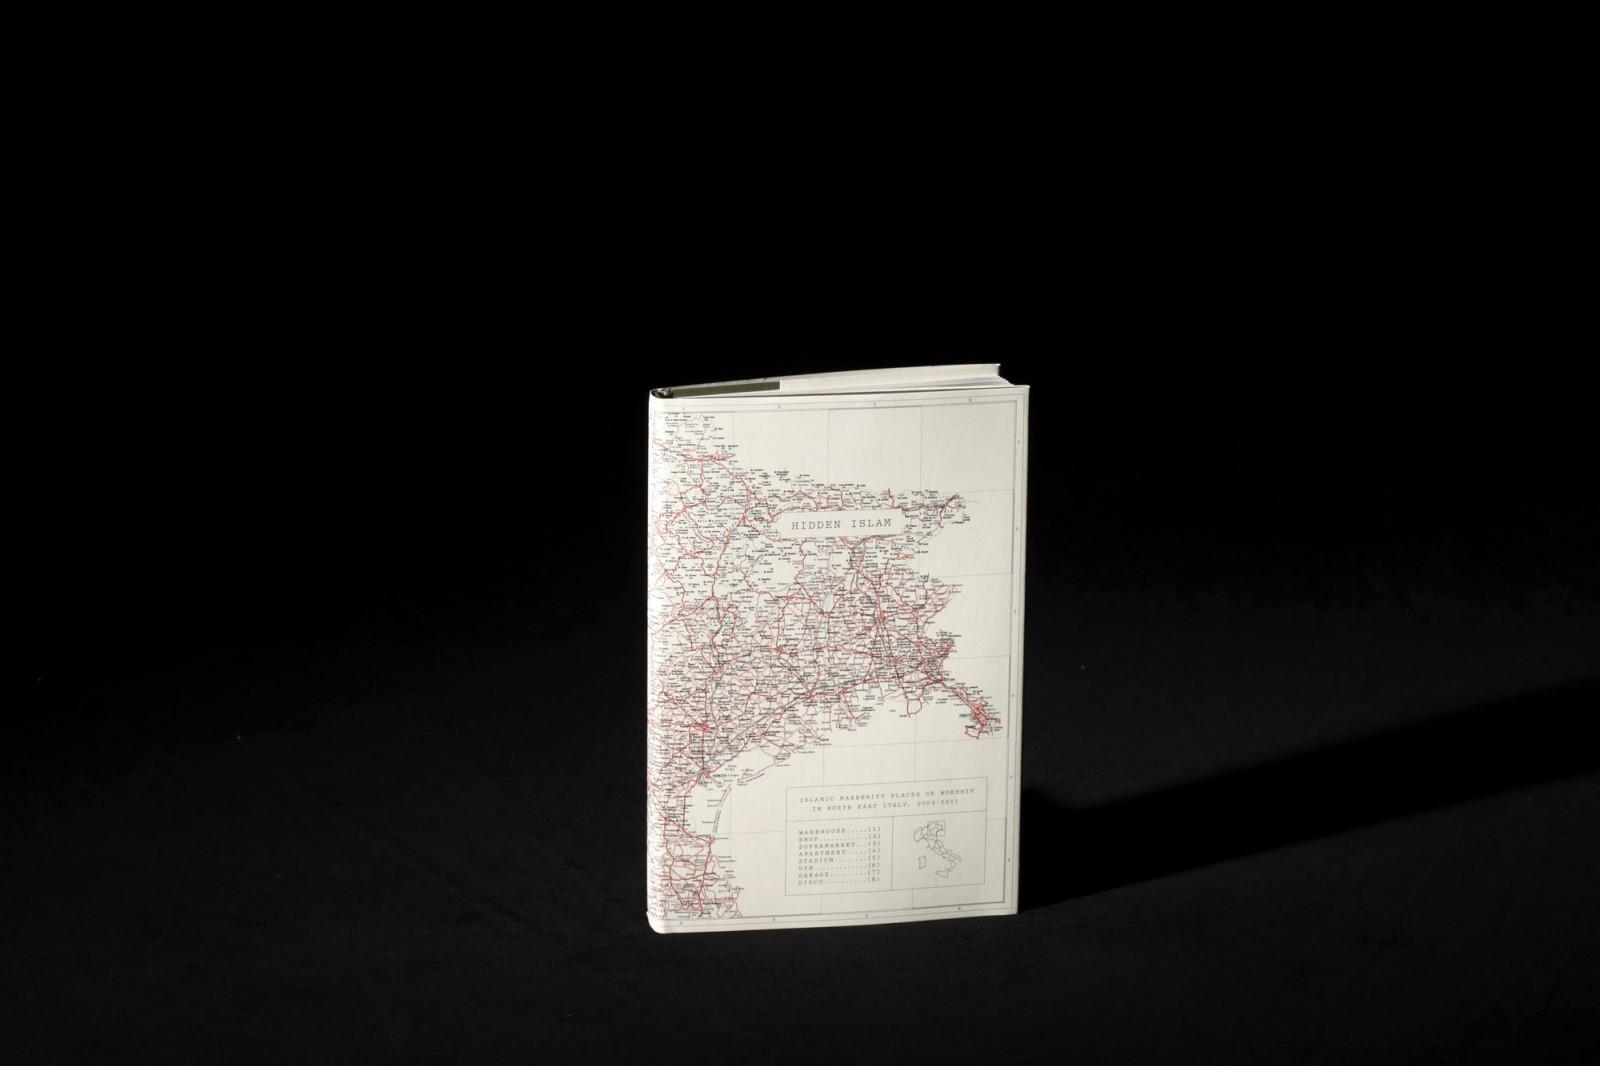 arles rencontres 2021 author book award)